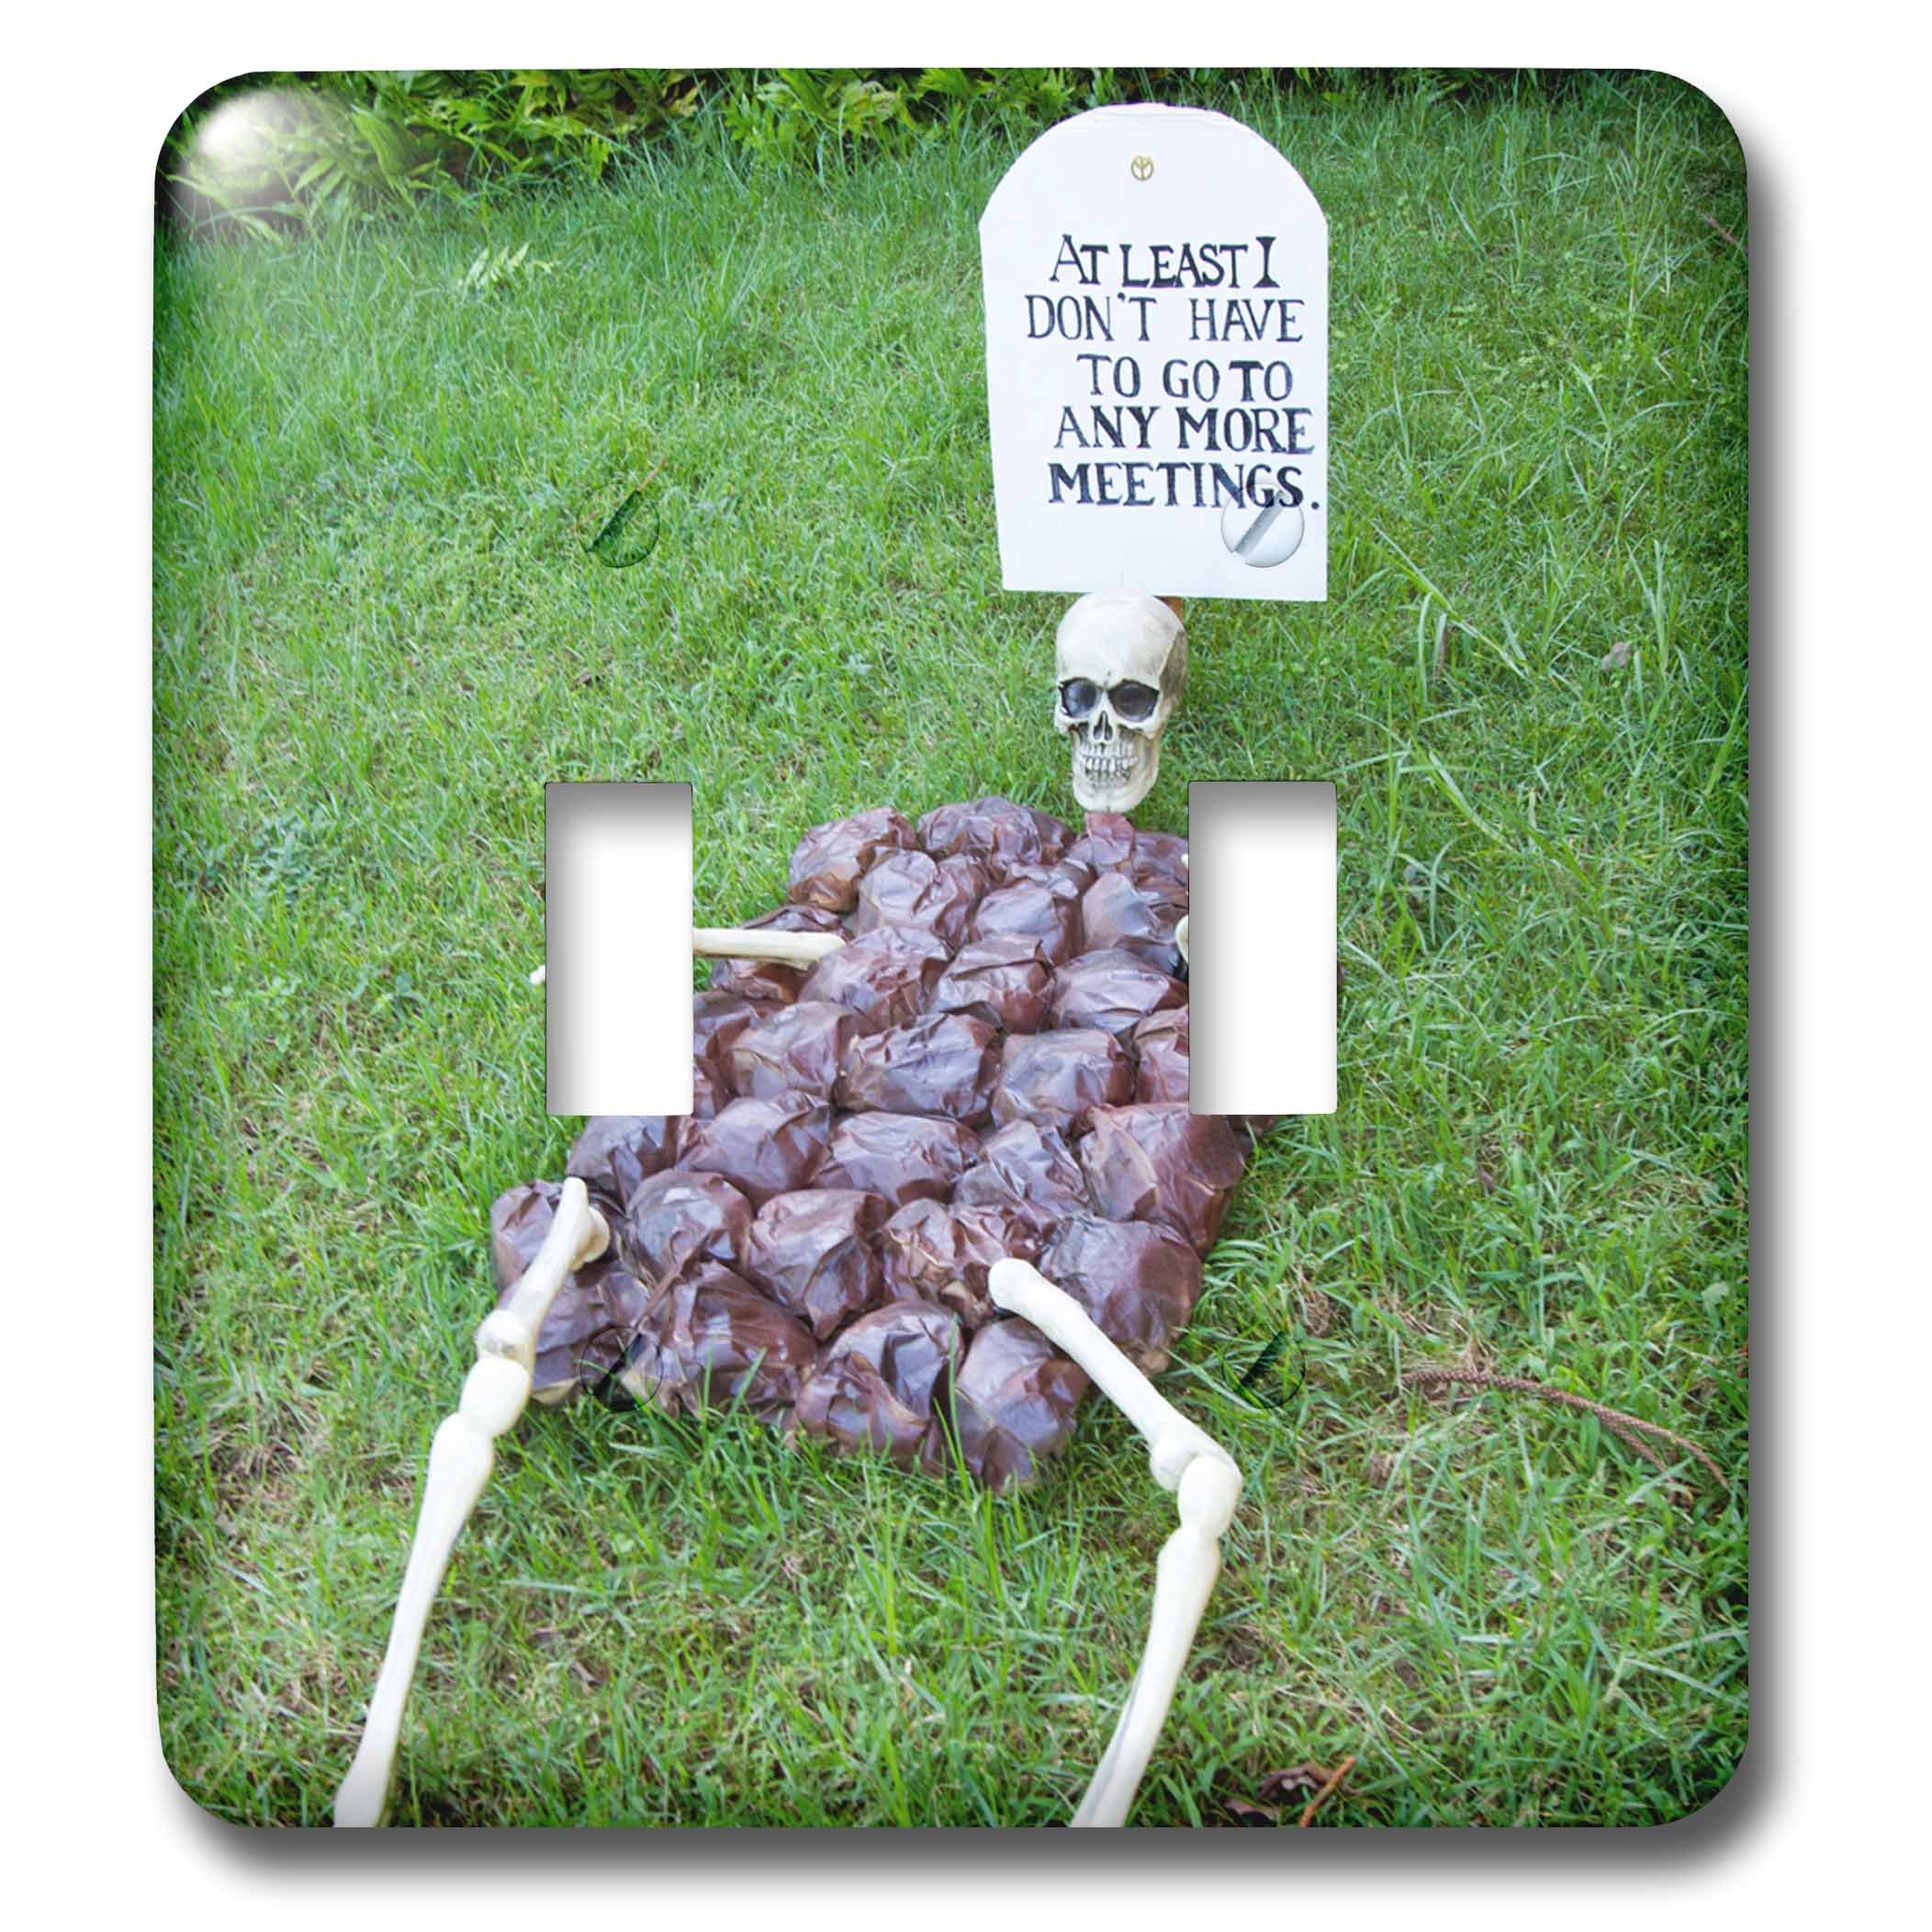 3dRose LSP_250803_2 Skeleton Express Anti Meeting Sentiment. Lanai. Hawaii. USA Toggle Switch, Mixed